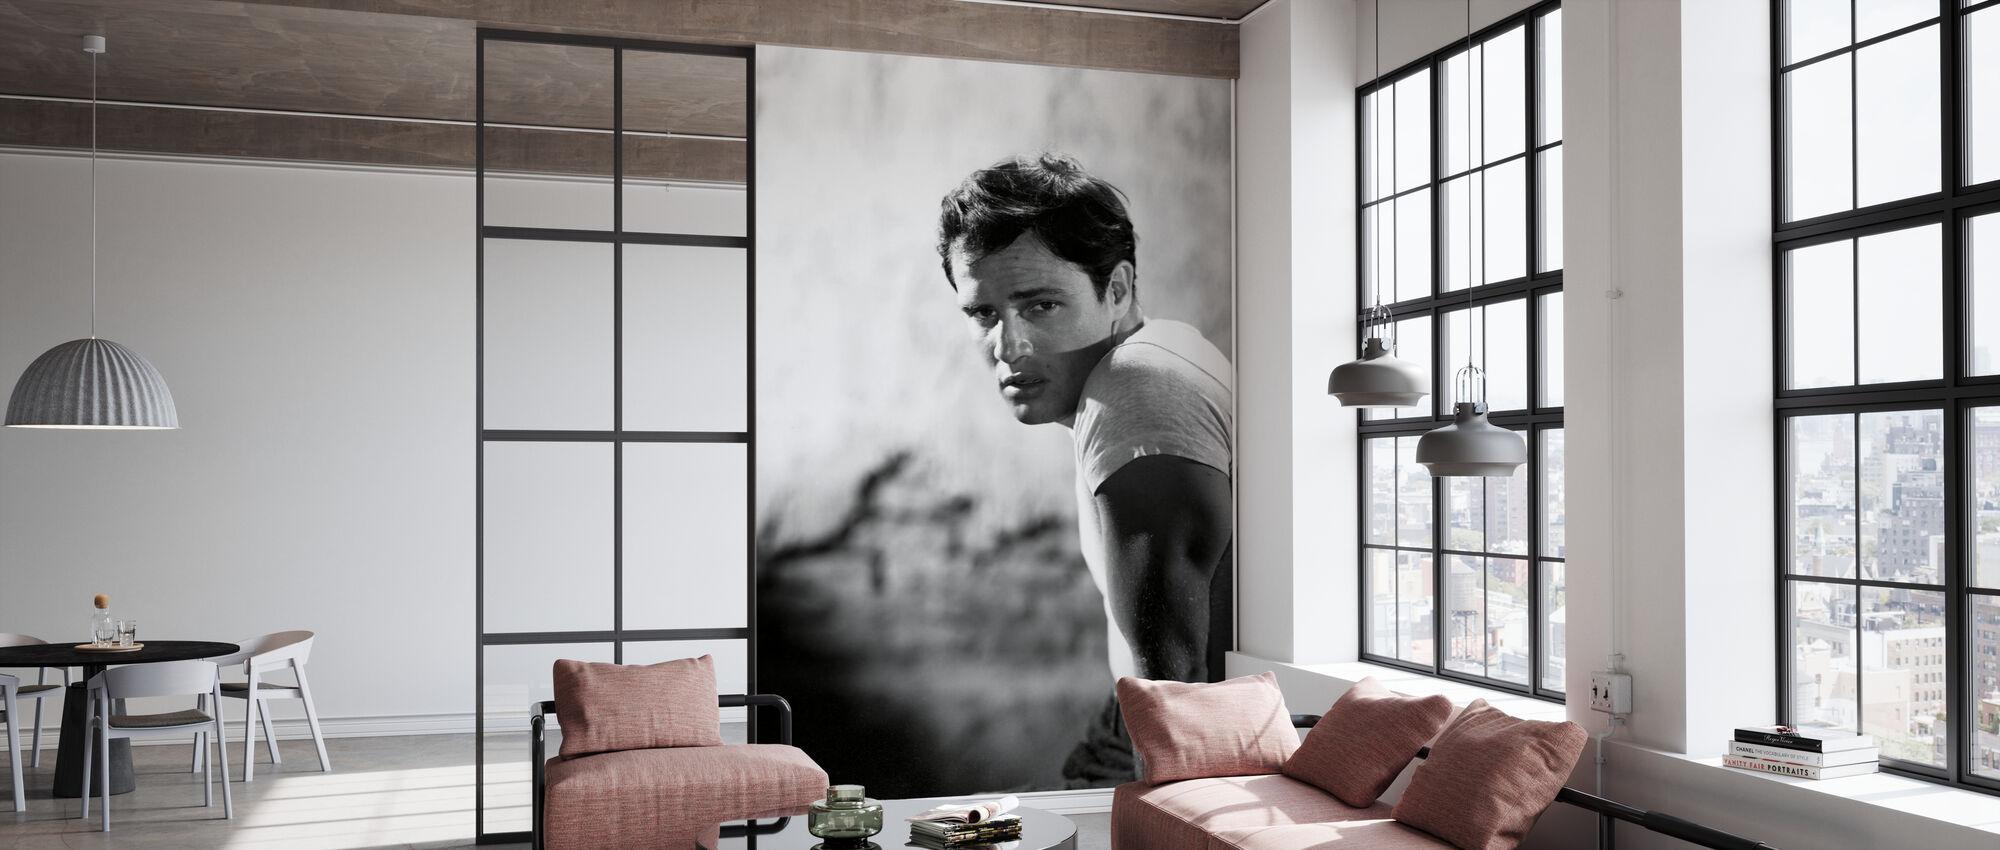 Marlon Brando in a Streetcar Named Desire - Wallpaper - Office